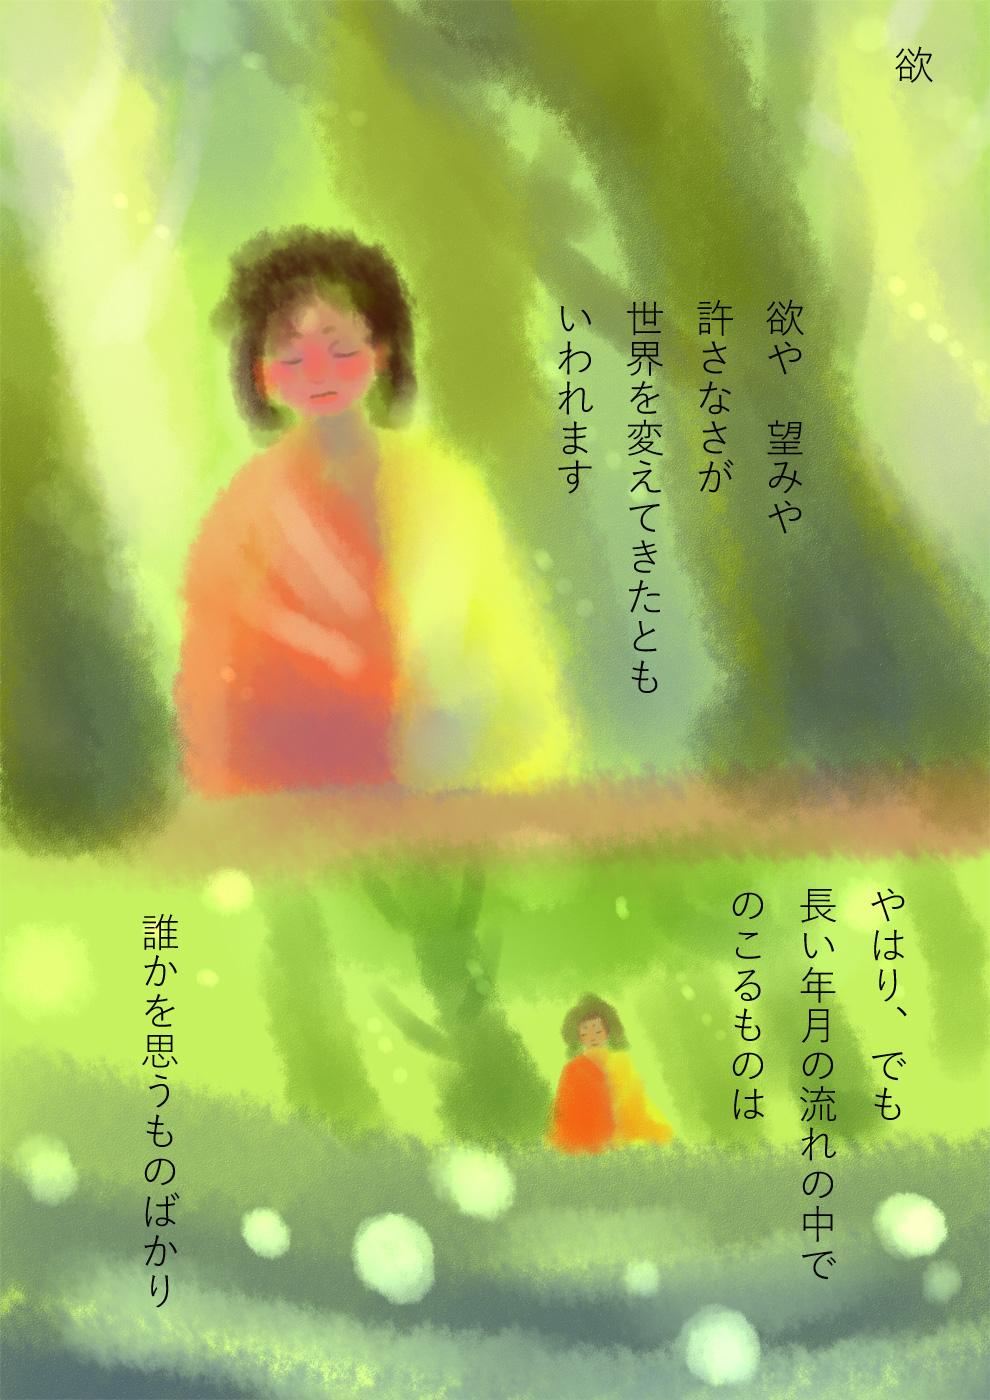 http://ahito.com/comic/ehon/voice/img/2018/20180323_2/01.jpg